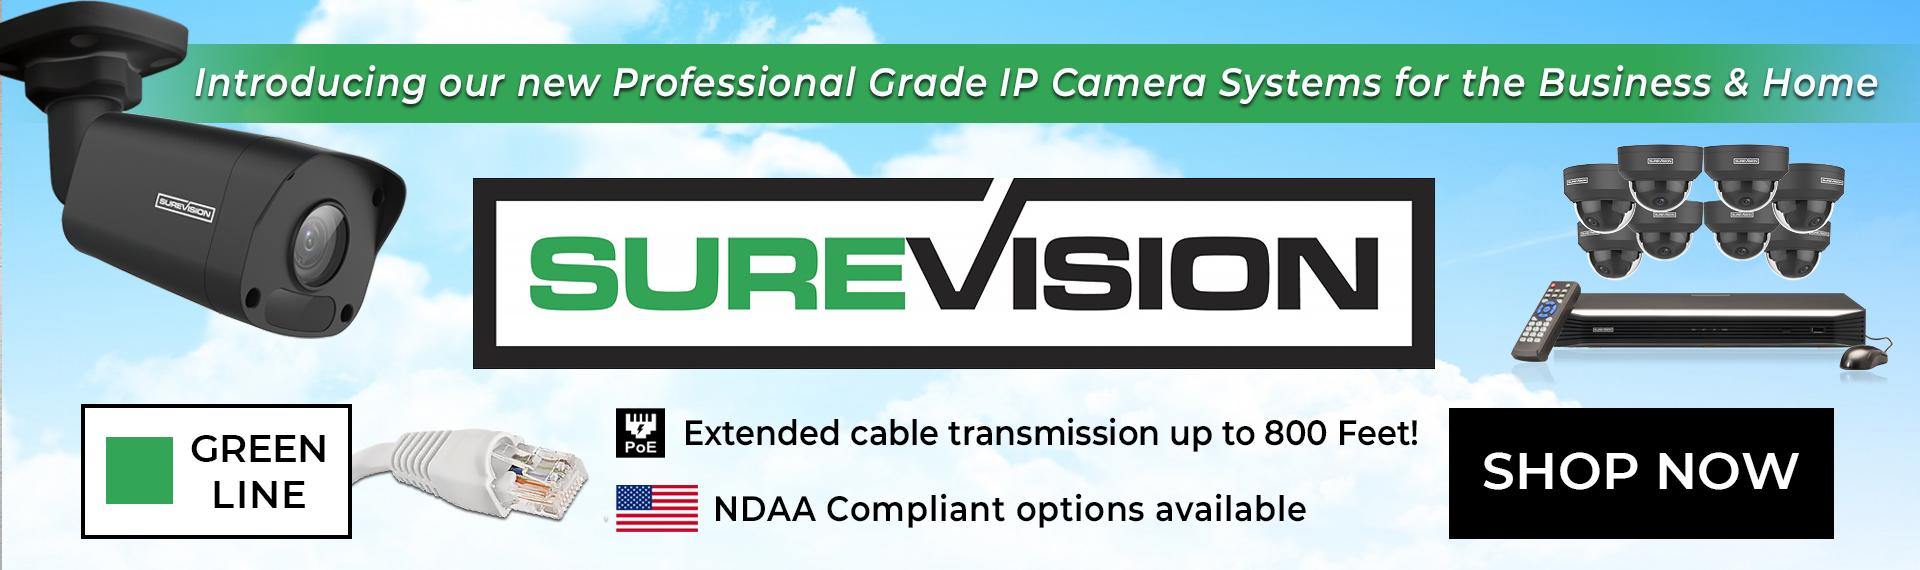 new-surevision-desktop-vs-2-1-.png